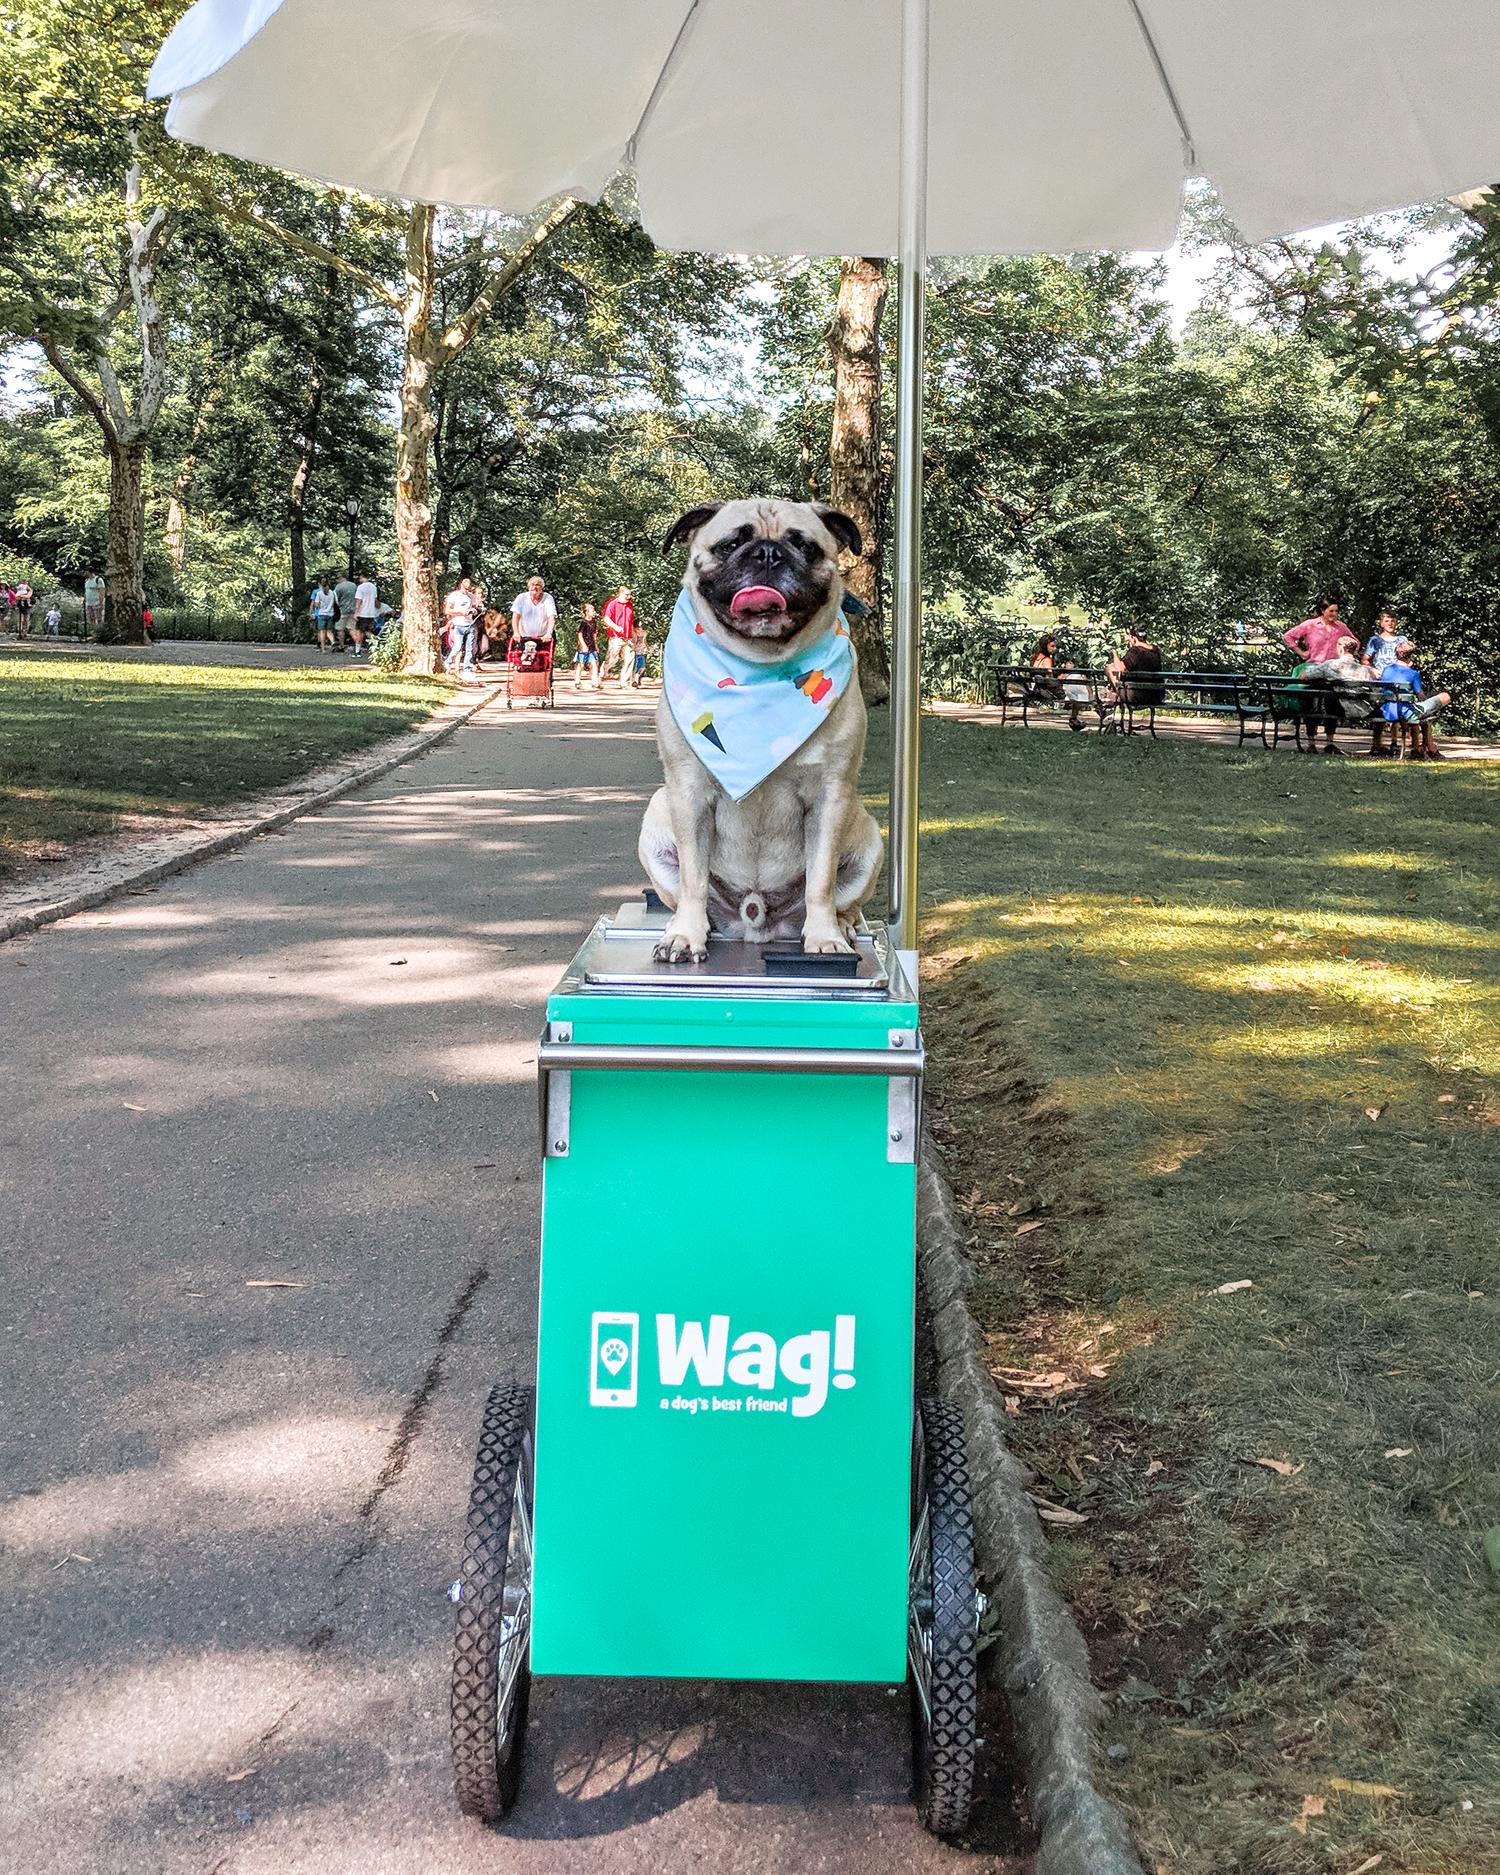 wag-nationalicecreamday-doggieicecream-newyorkcity-dogfriendlynewyork-funthingsfordogs-newyorkpups-dogsofnyc-wagwalking-nycinfluencer-puglife-pug-pugeatingicecream 6.jpg